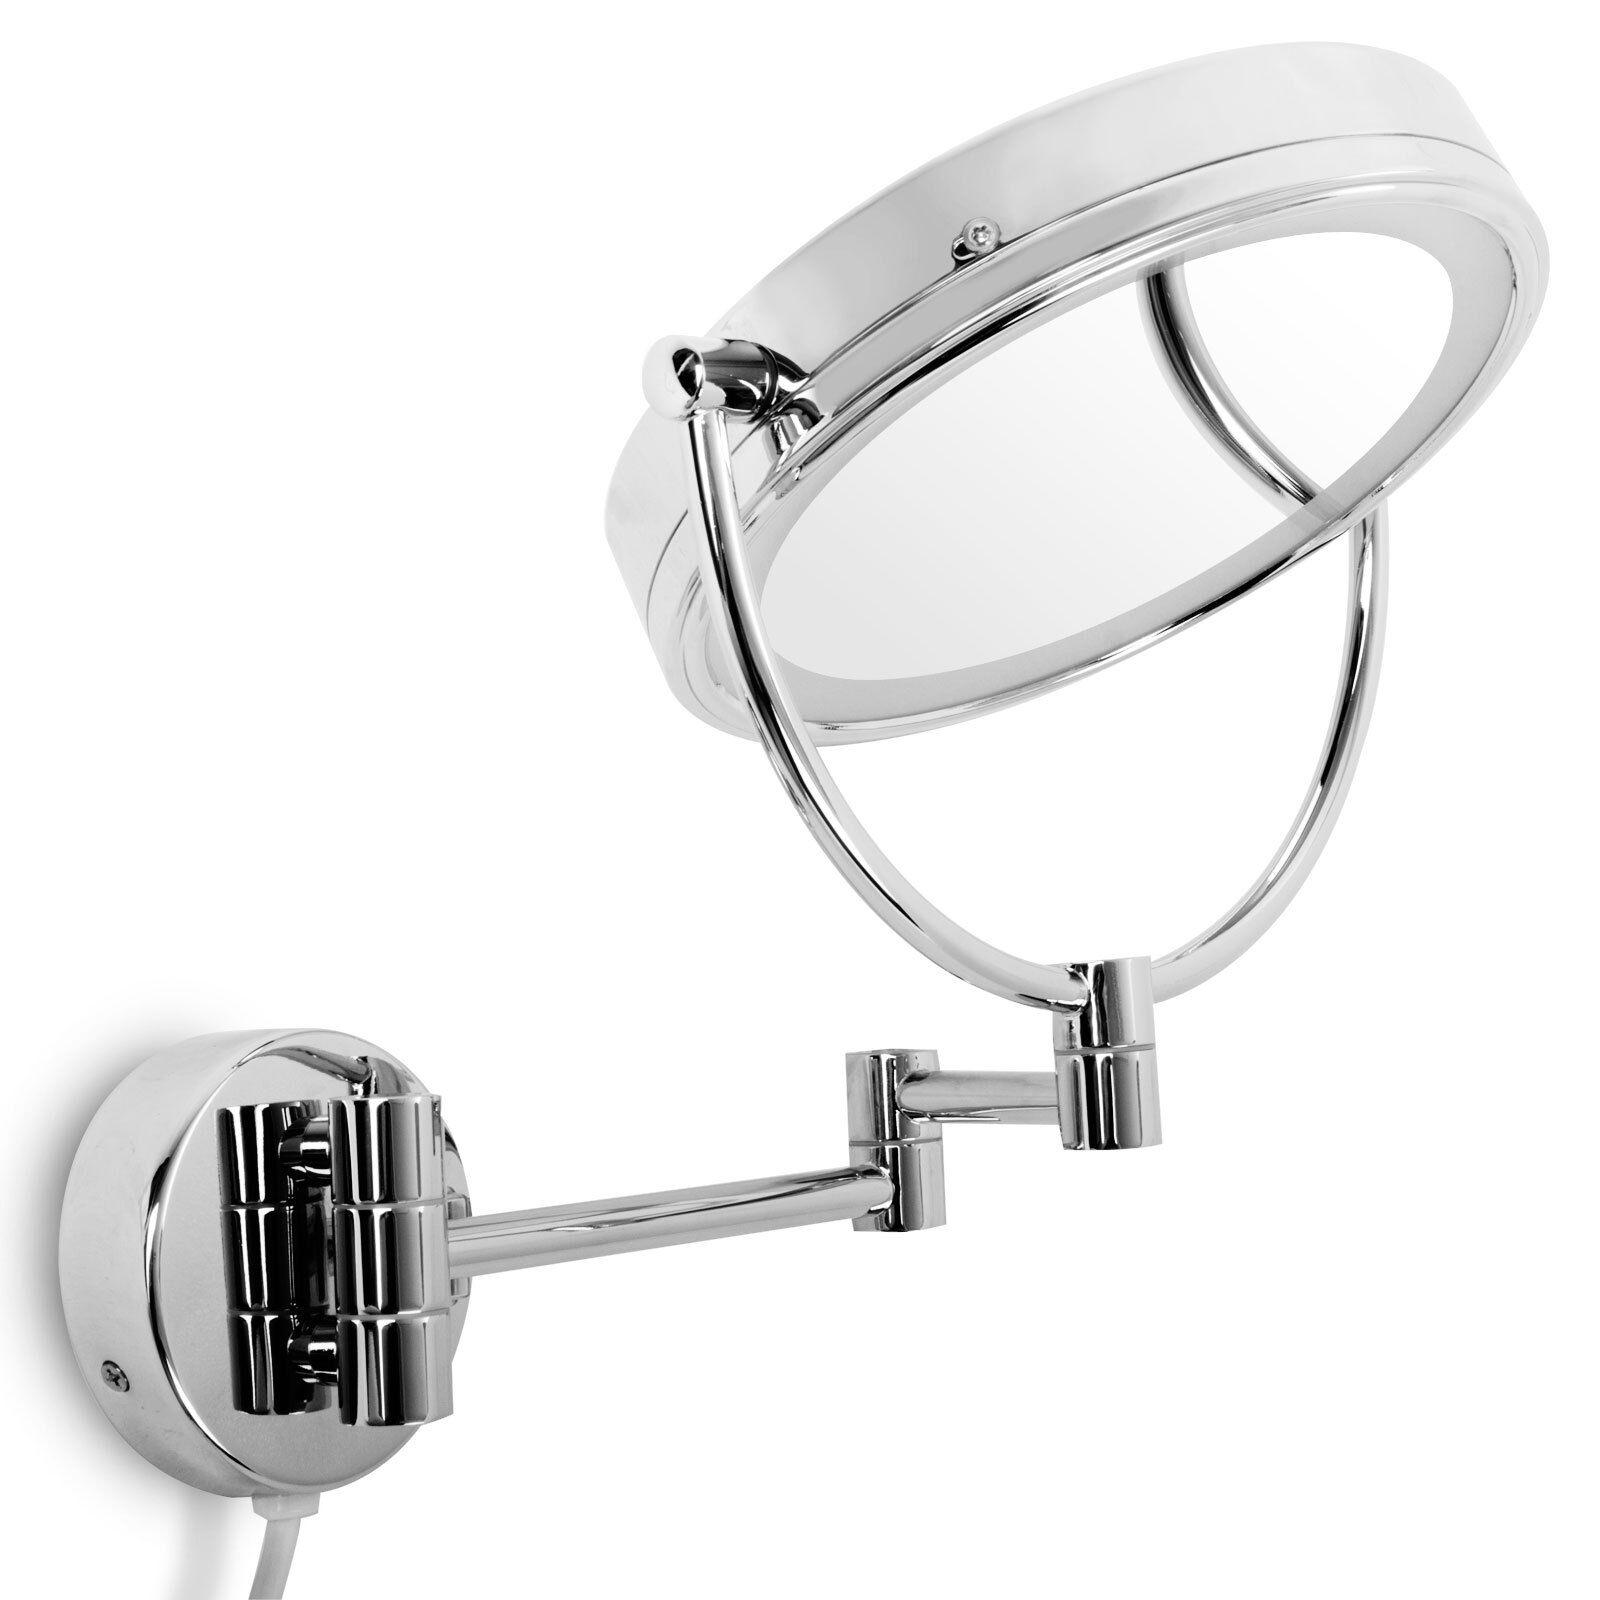 casa pura kosmetikspiegel mit led beleuchtung f r die wandmontage spiegel eur 999 99 picclick de. Black Bedroom Furniture Sets. Home Design Ideas